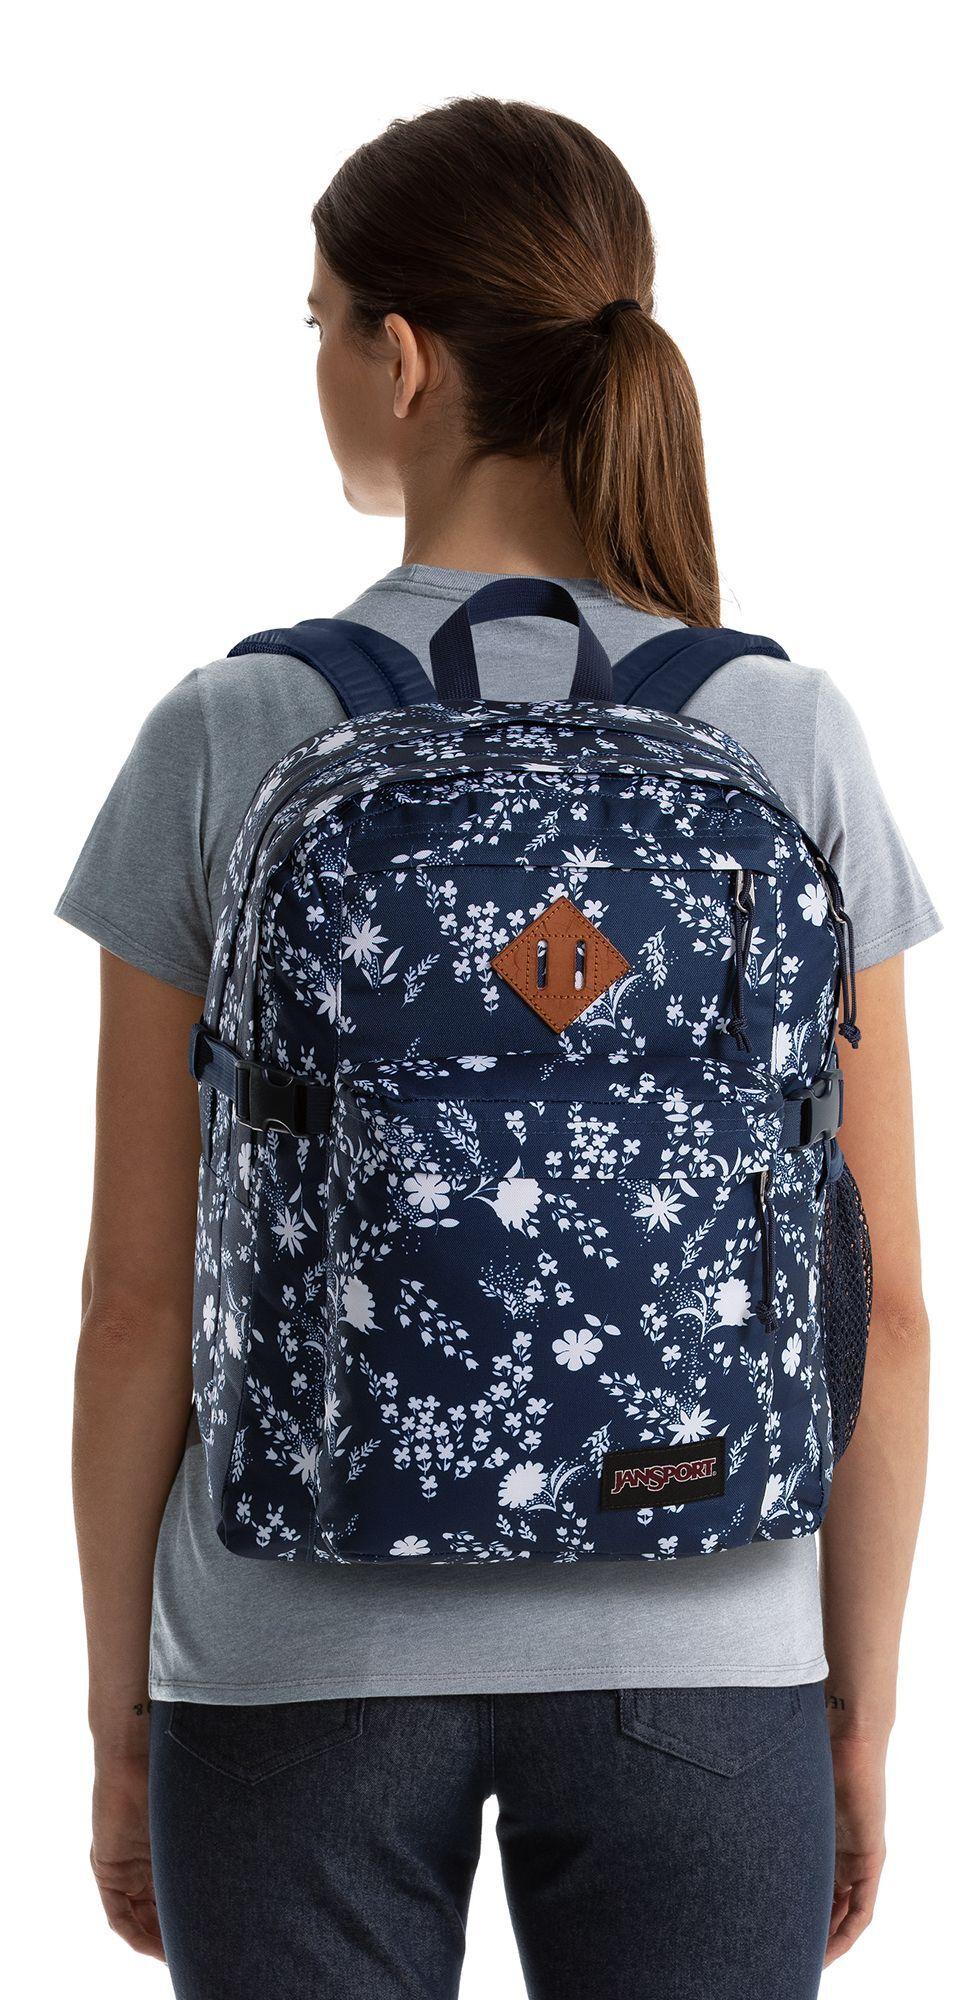 JanSport Main Campus Backpack, Charmed Garden